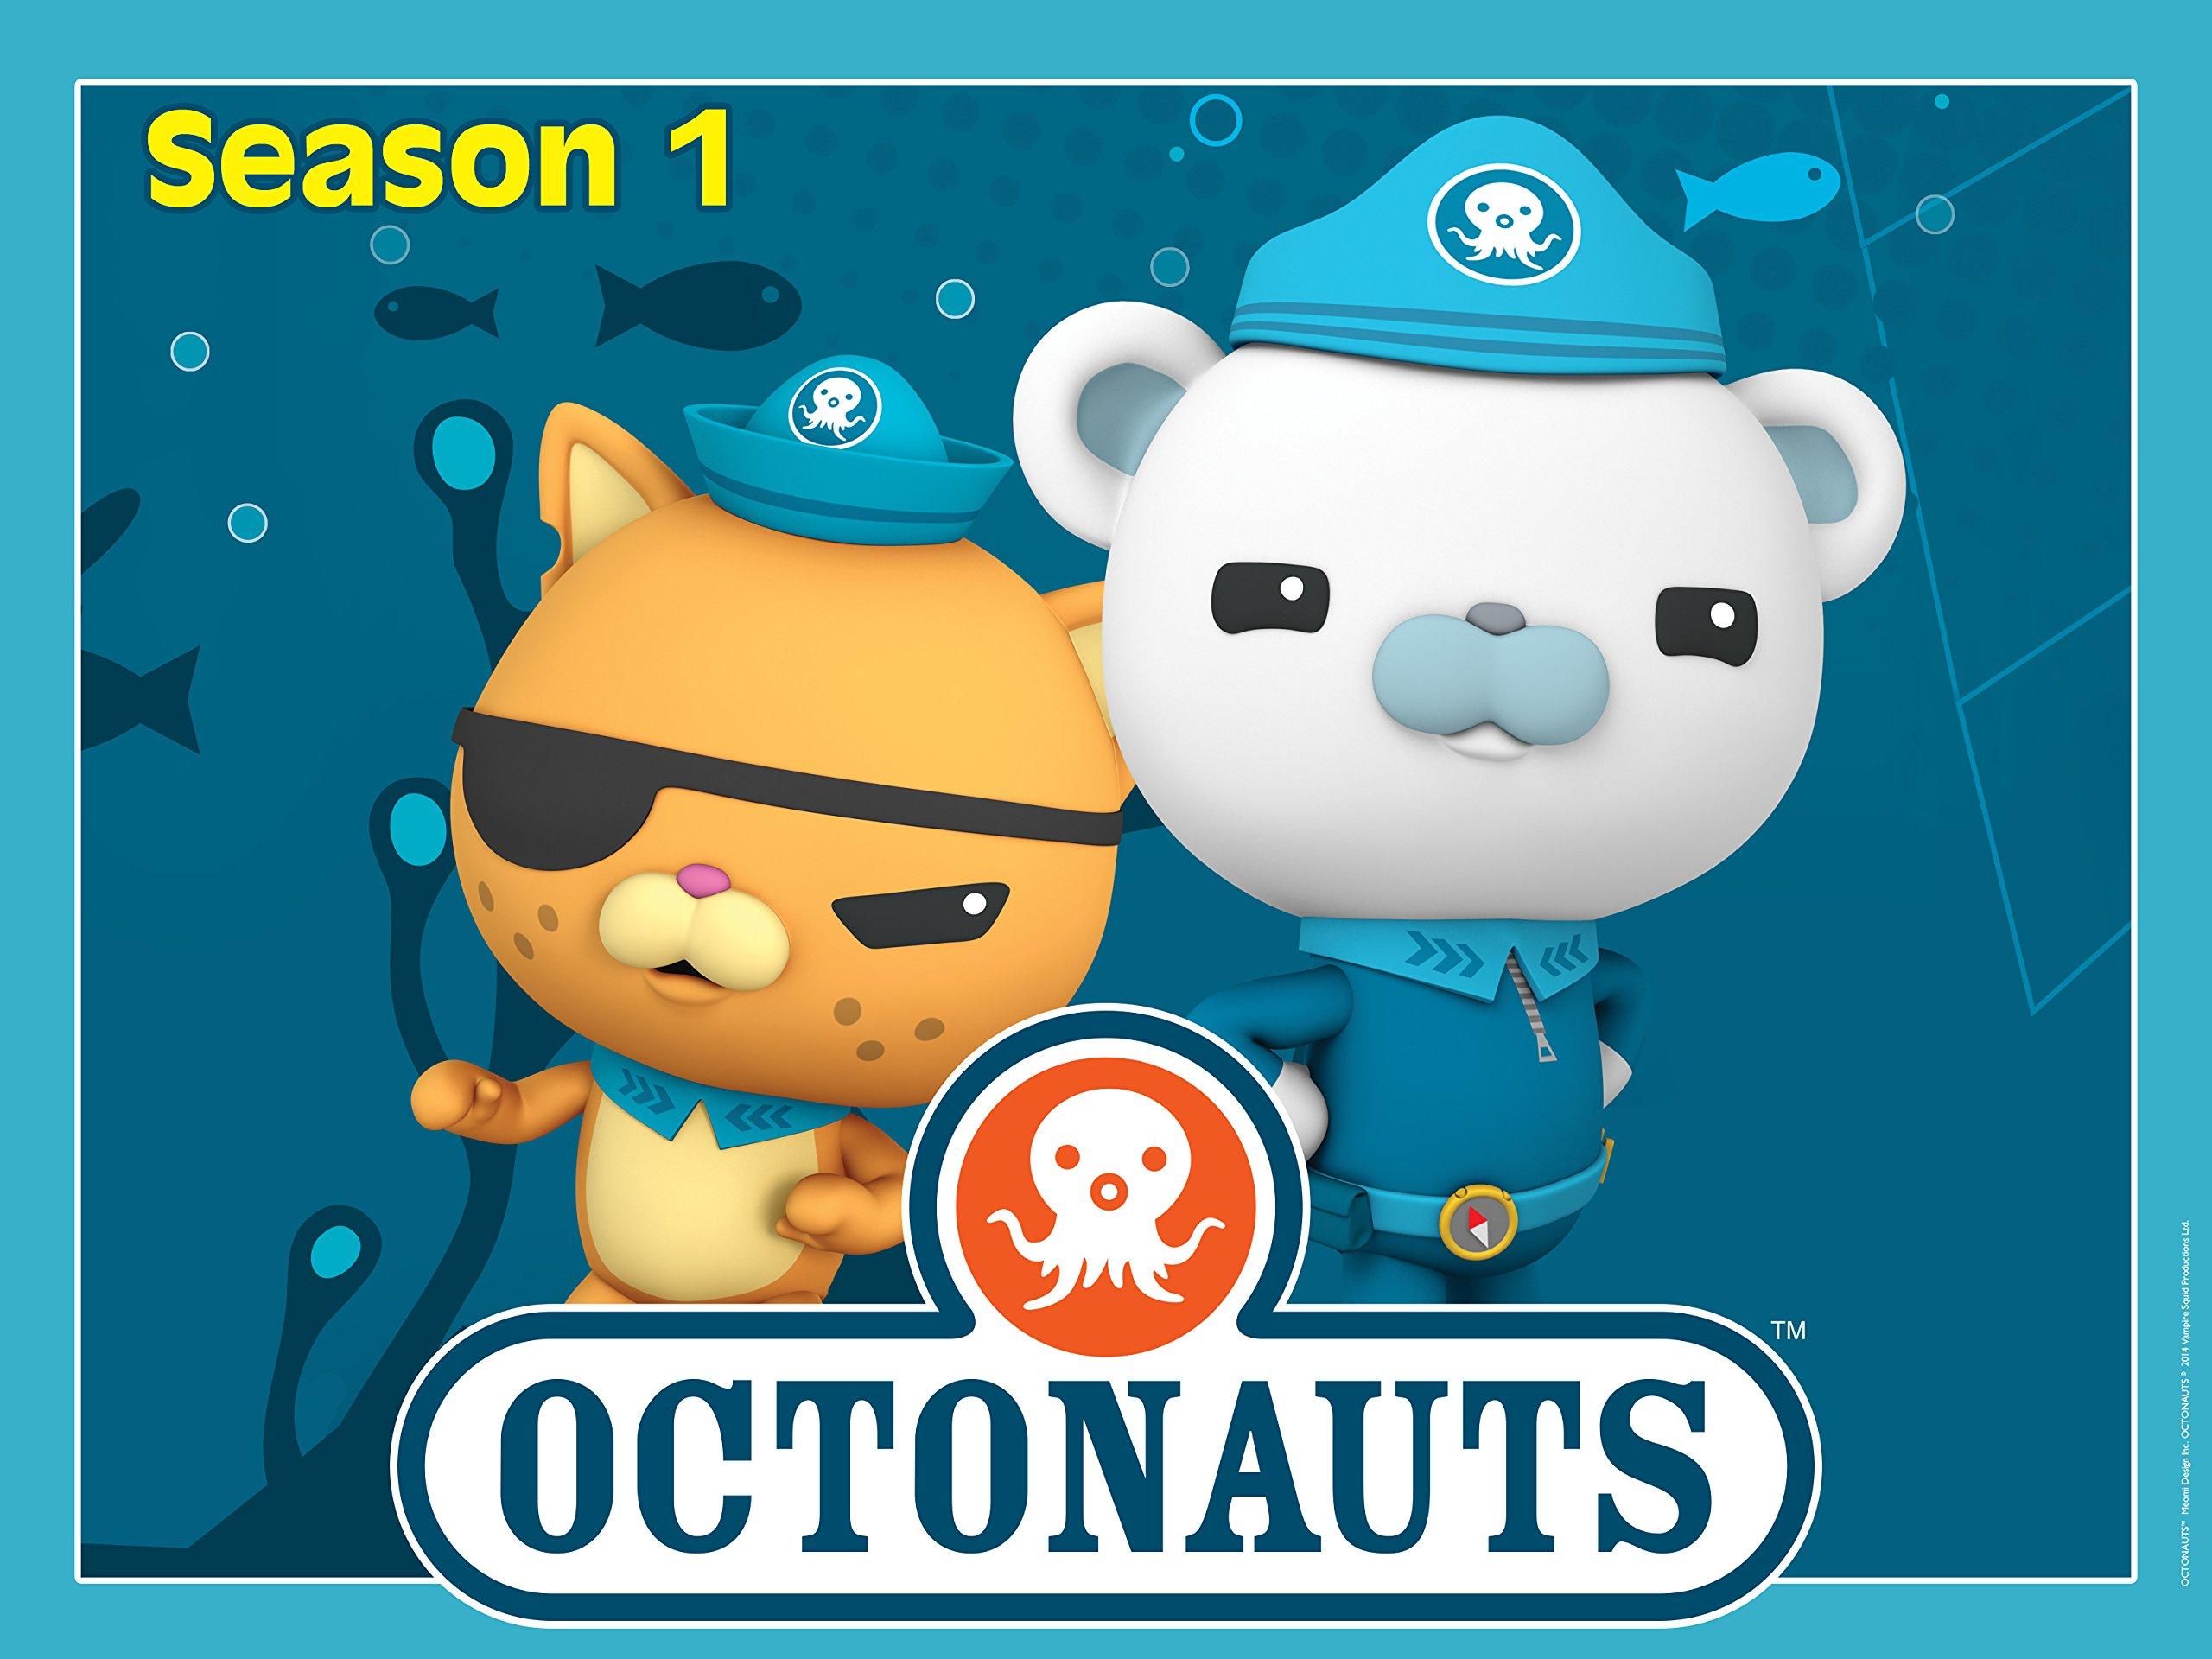 Amazon.com: The Octonauts Season 1: Amazon Digital Services LLC